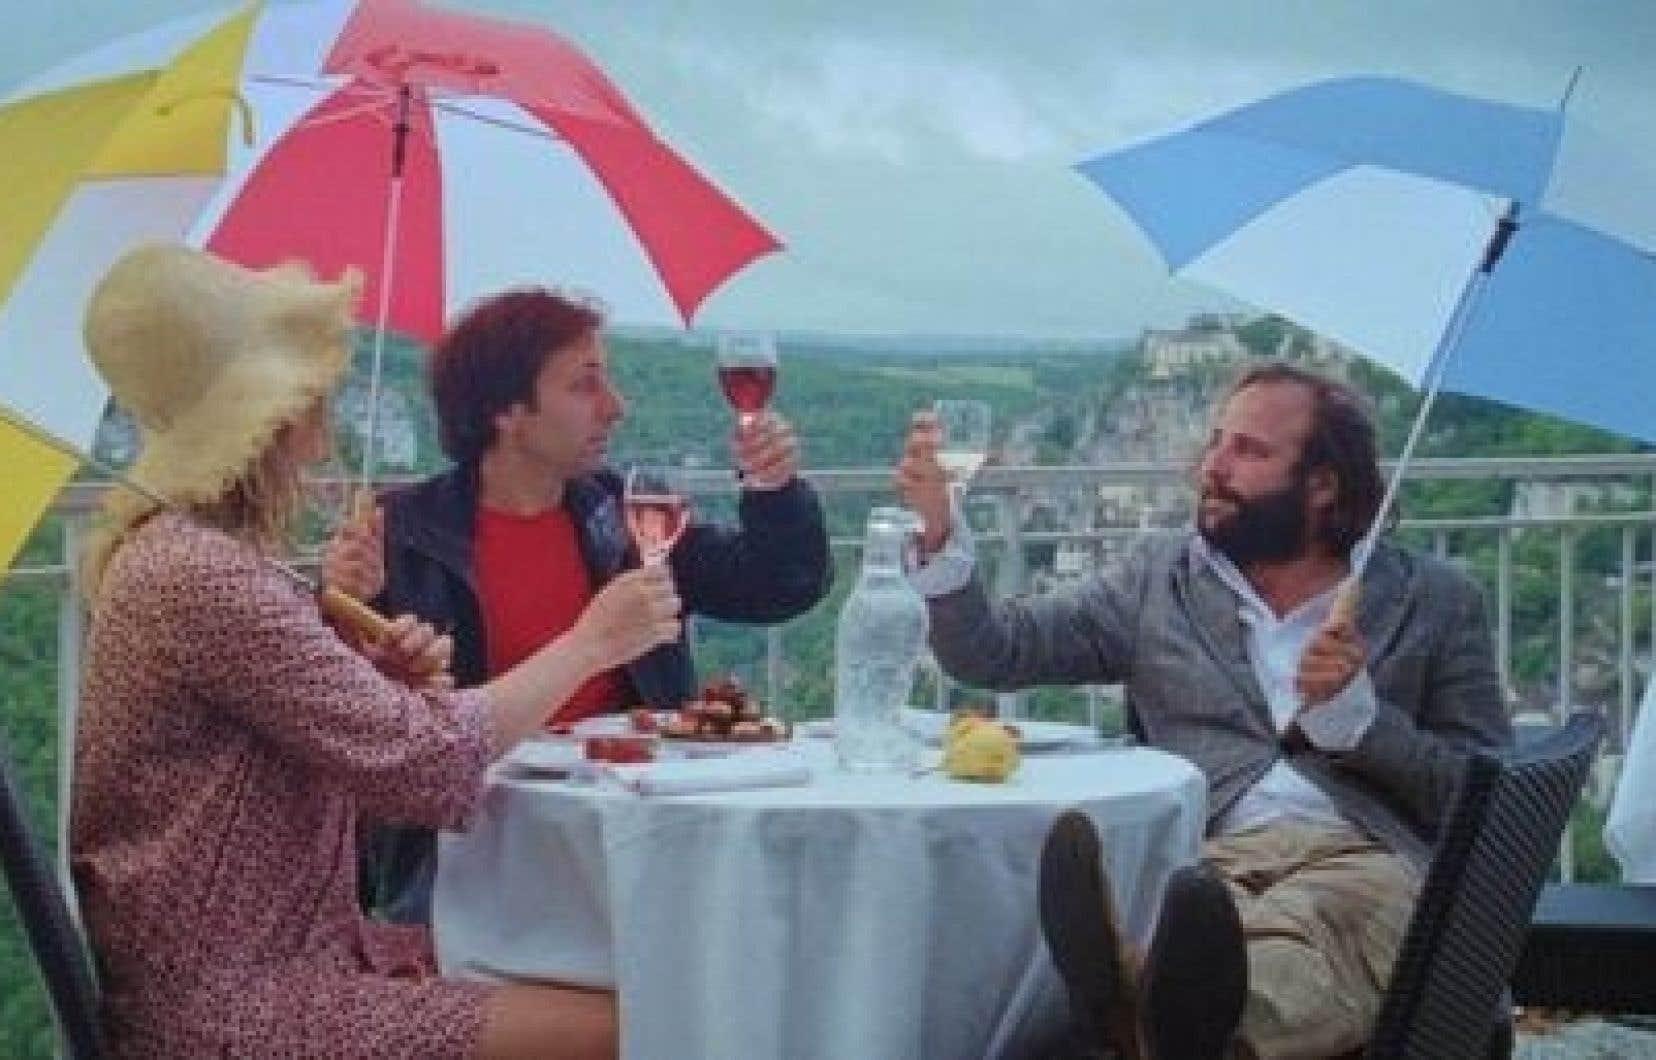 Tiré du film La fille du 14 juillet d'Antonin Peretjatko